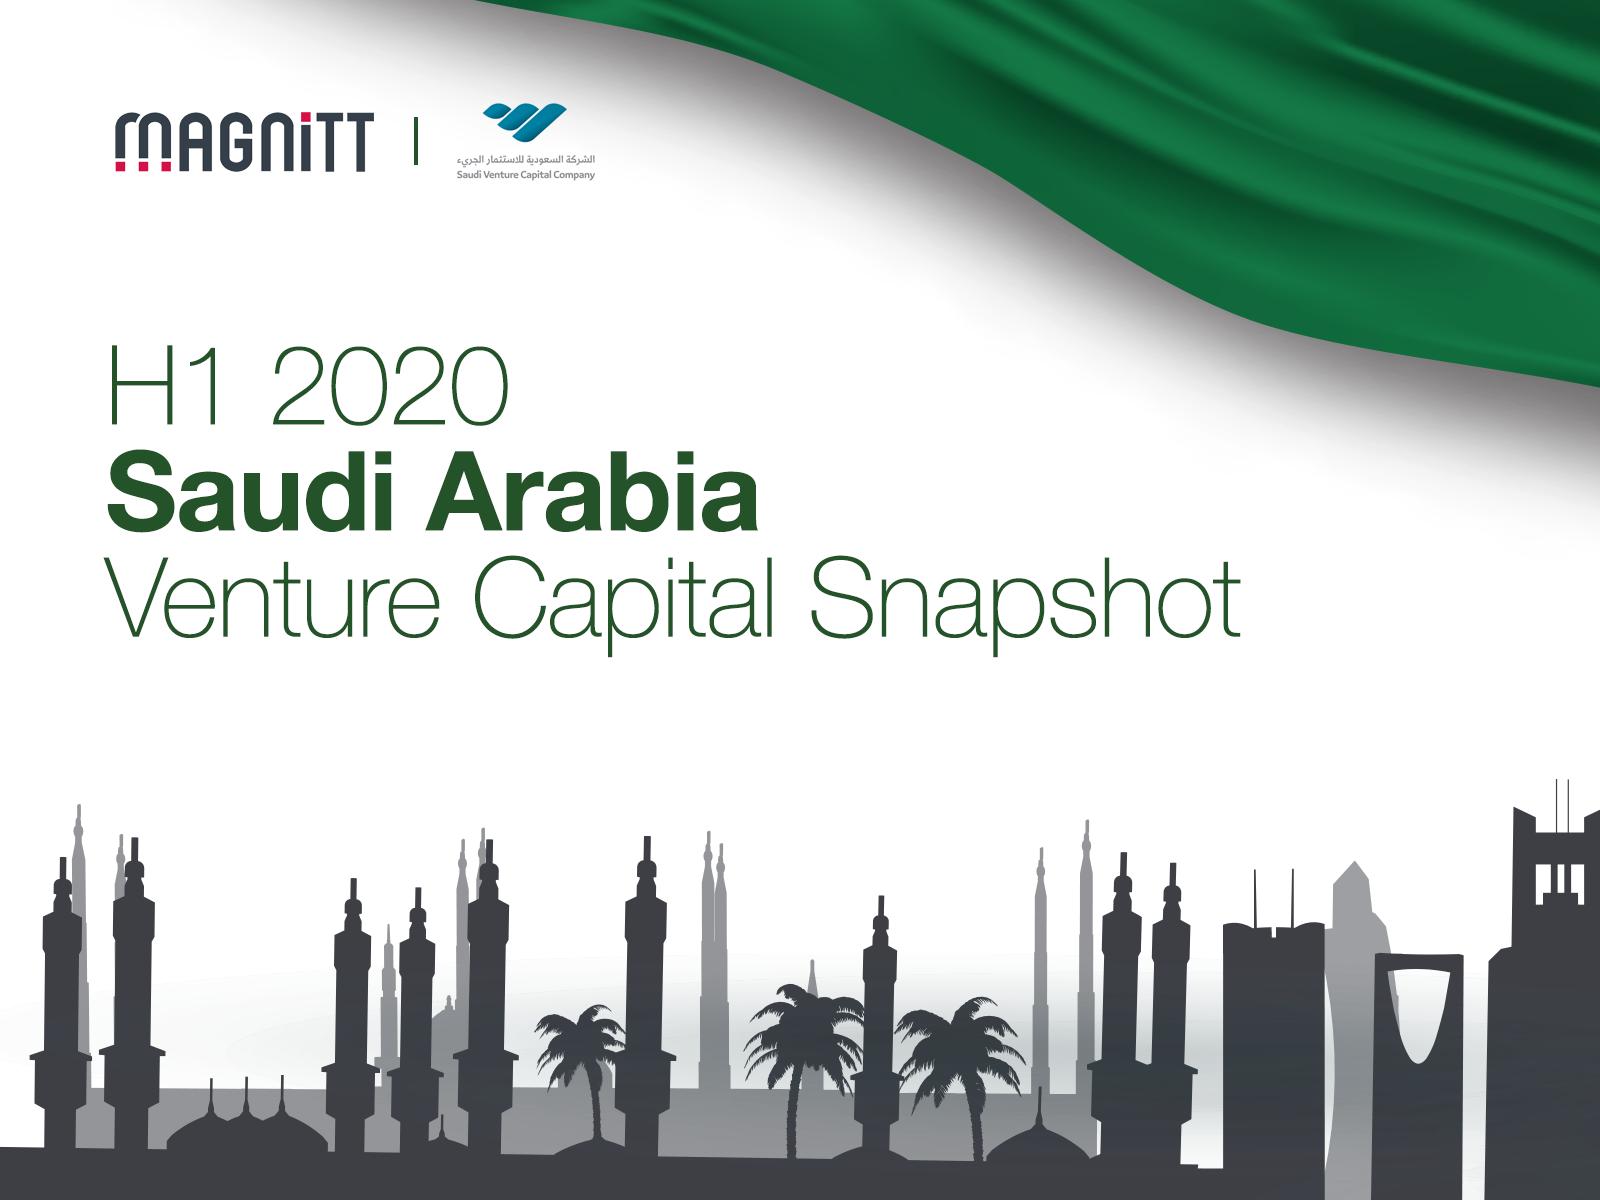 Saudi Arabia's startup funding up 102% in H1 2020, already surpassing full-year 2019, according to MAGNiTT report